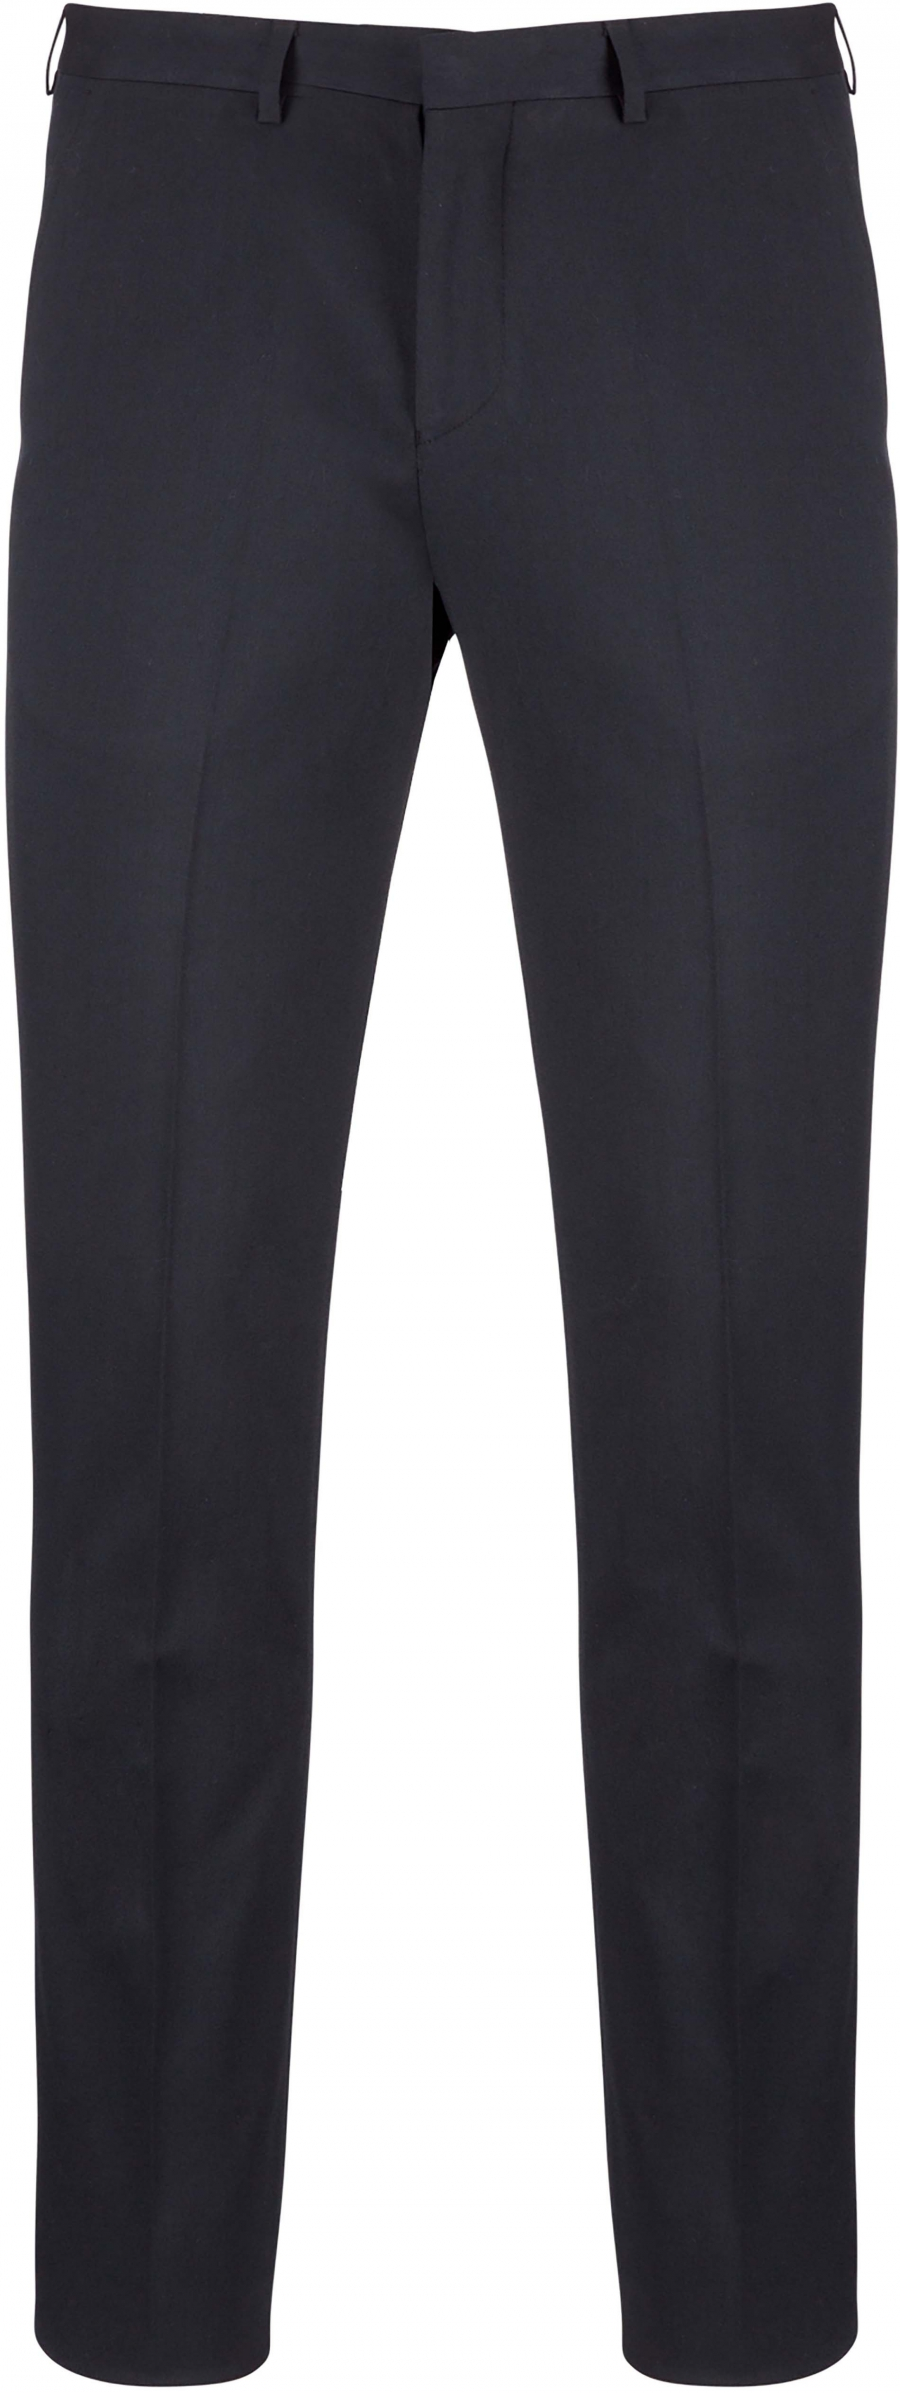 Pantalon homme - 2-1491-4